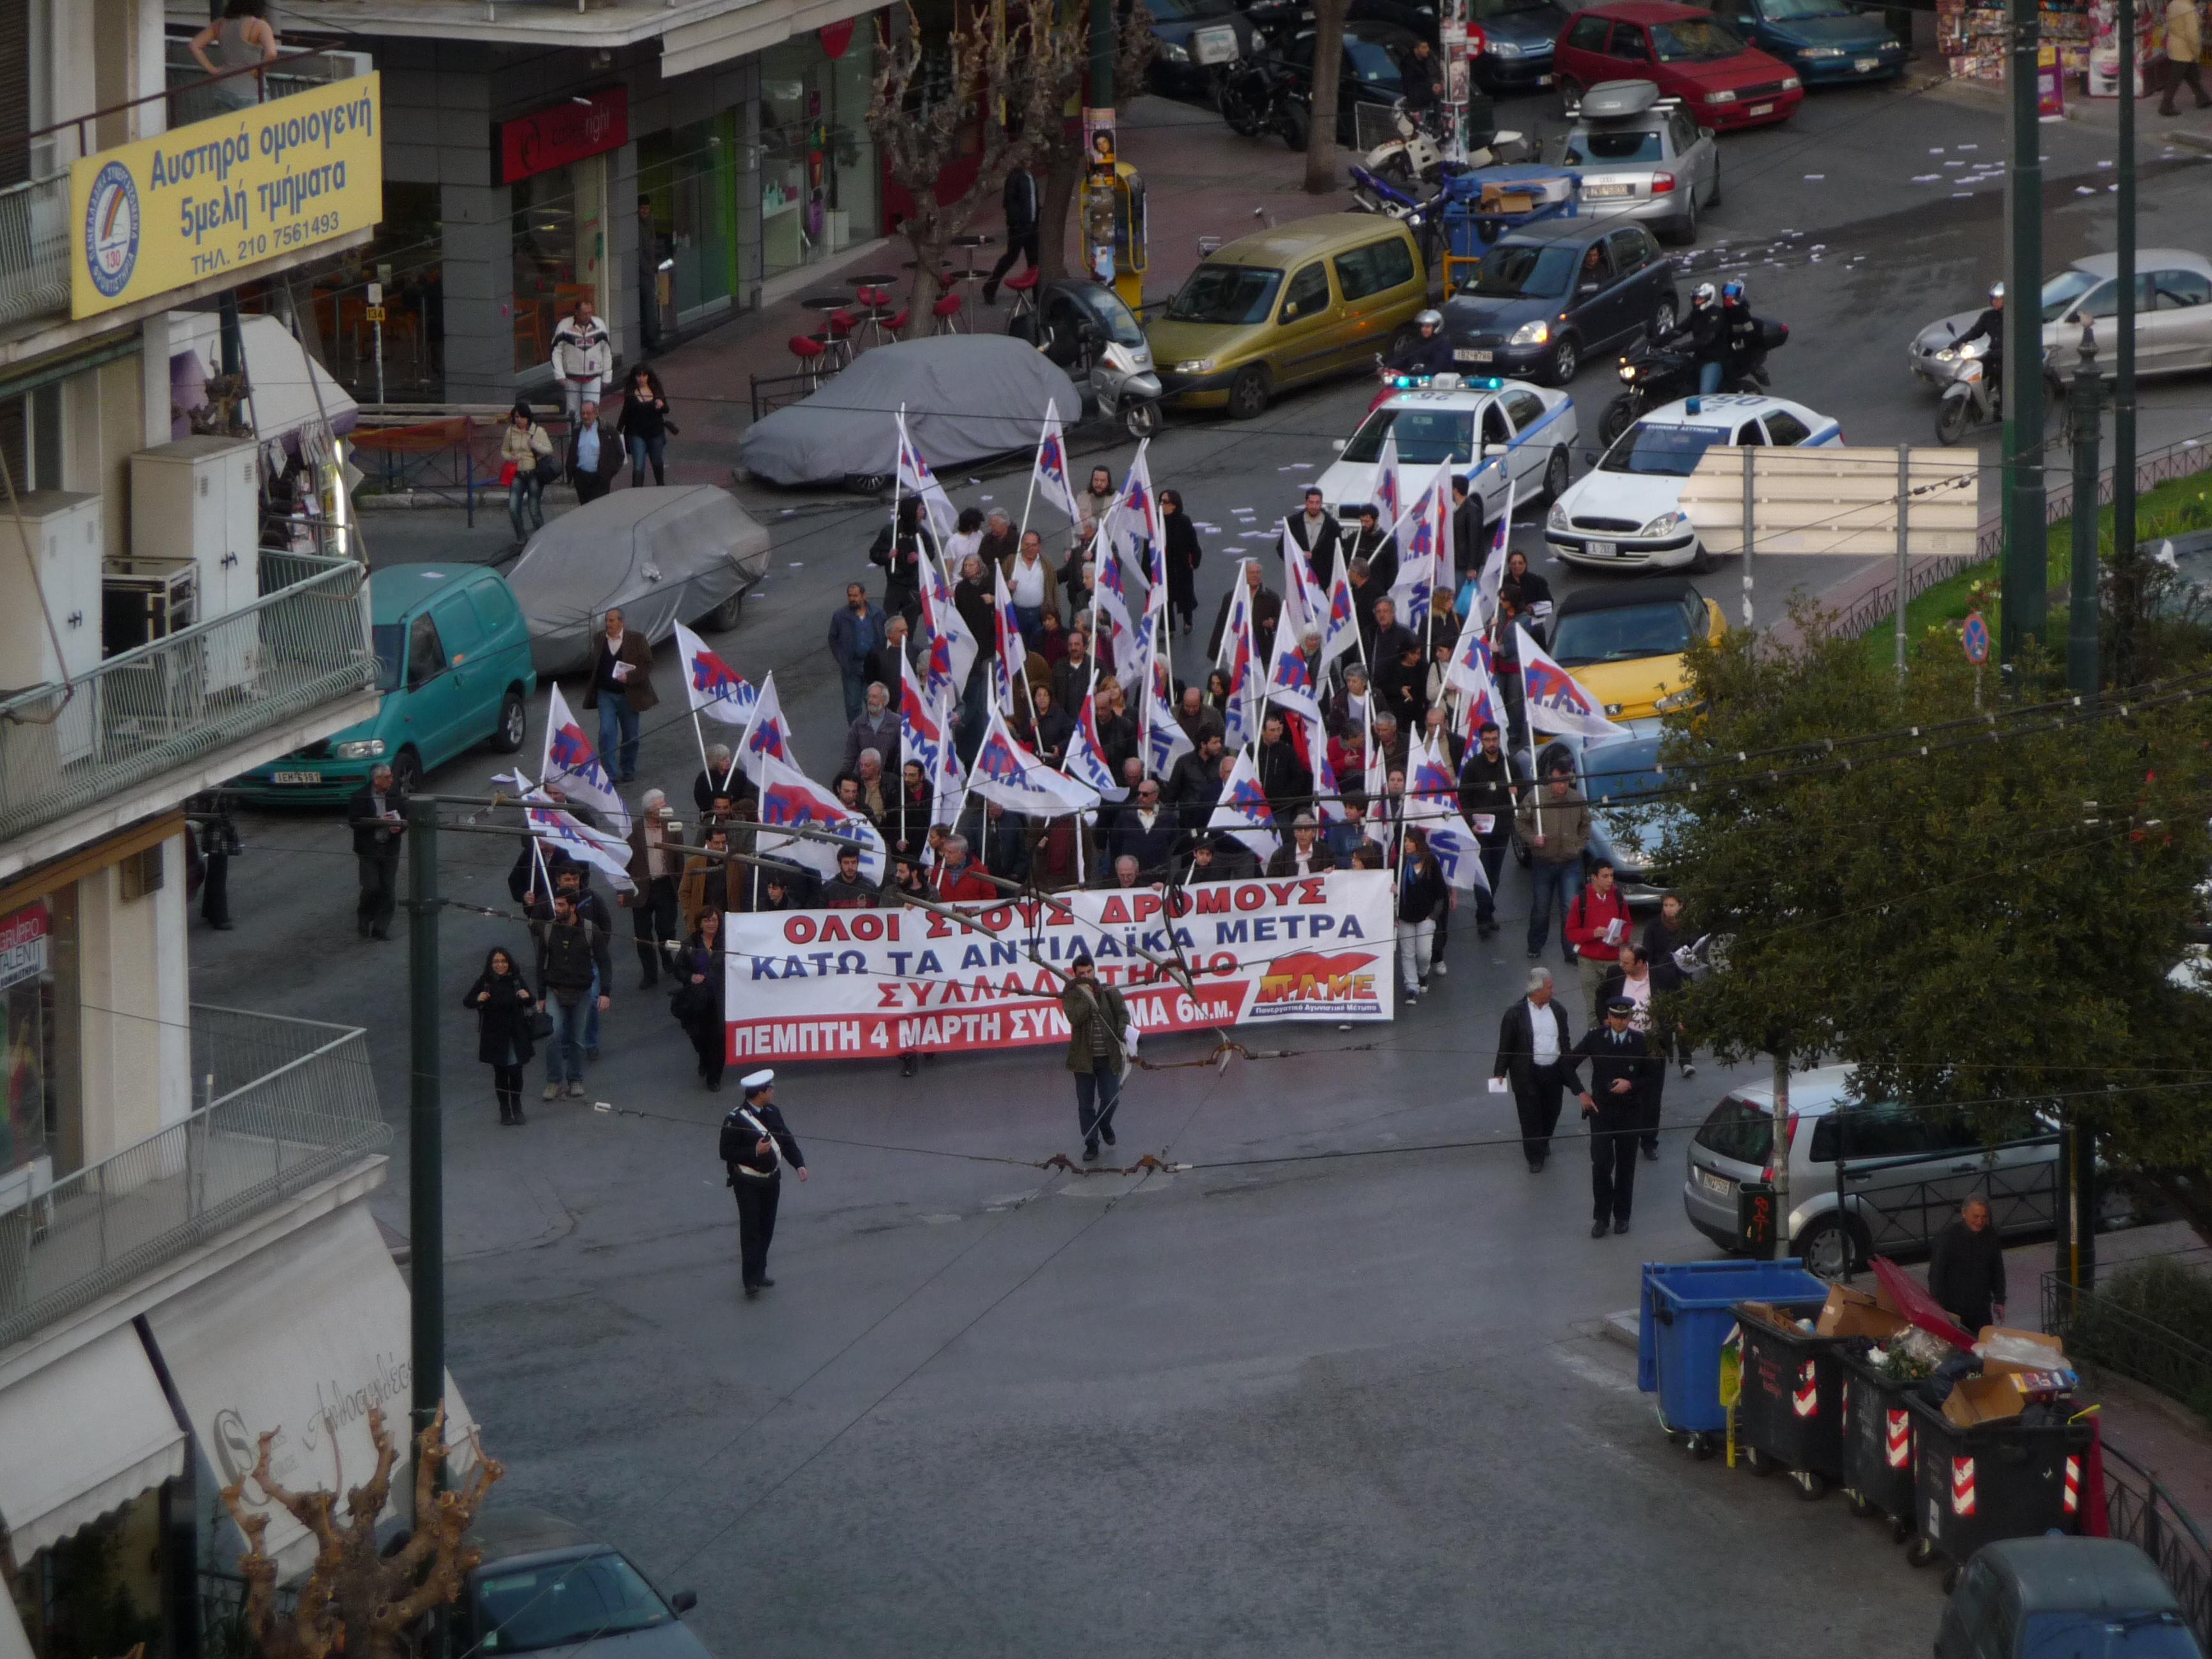 Riots, Strikes, Demonstations … 'Tis the season in Athens